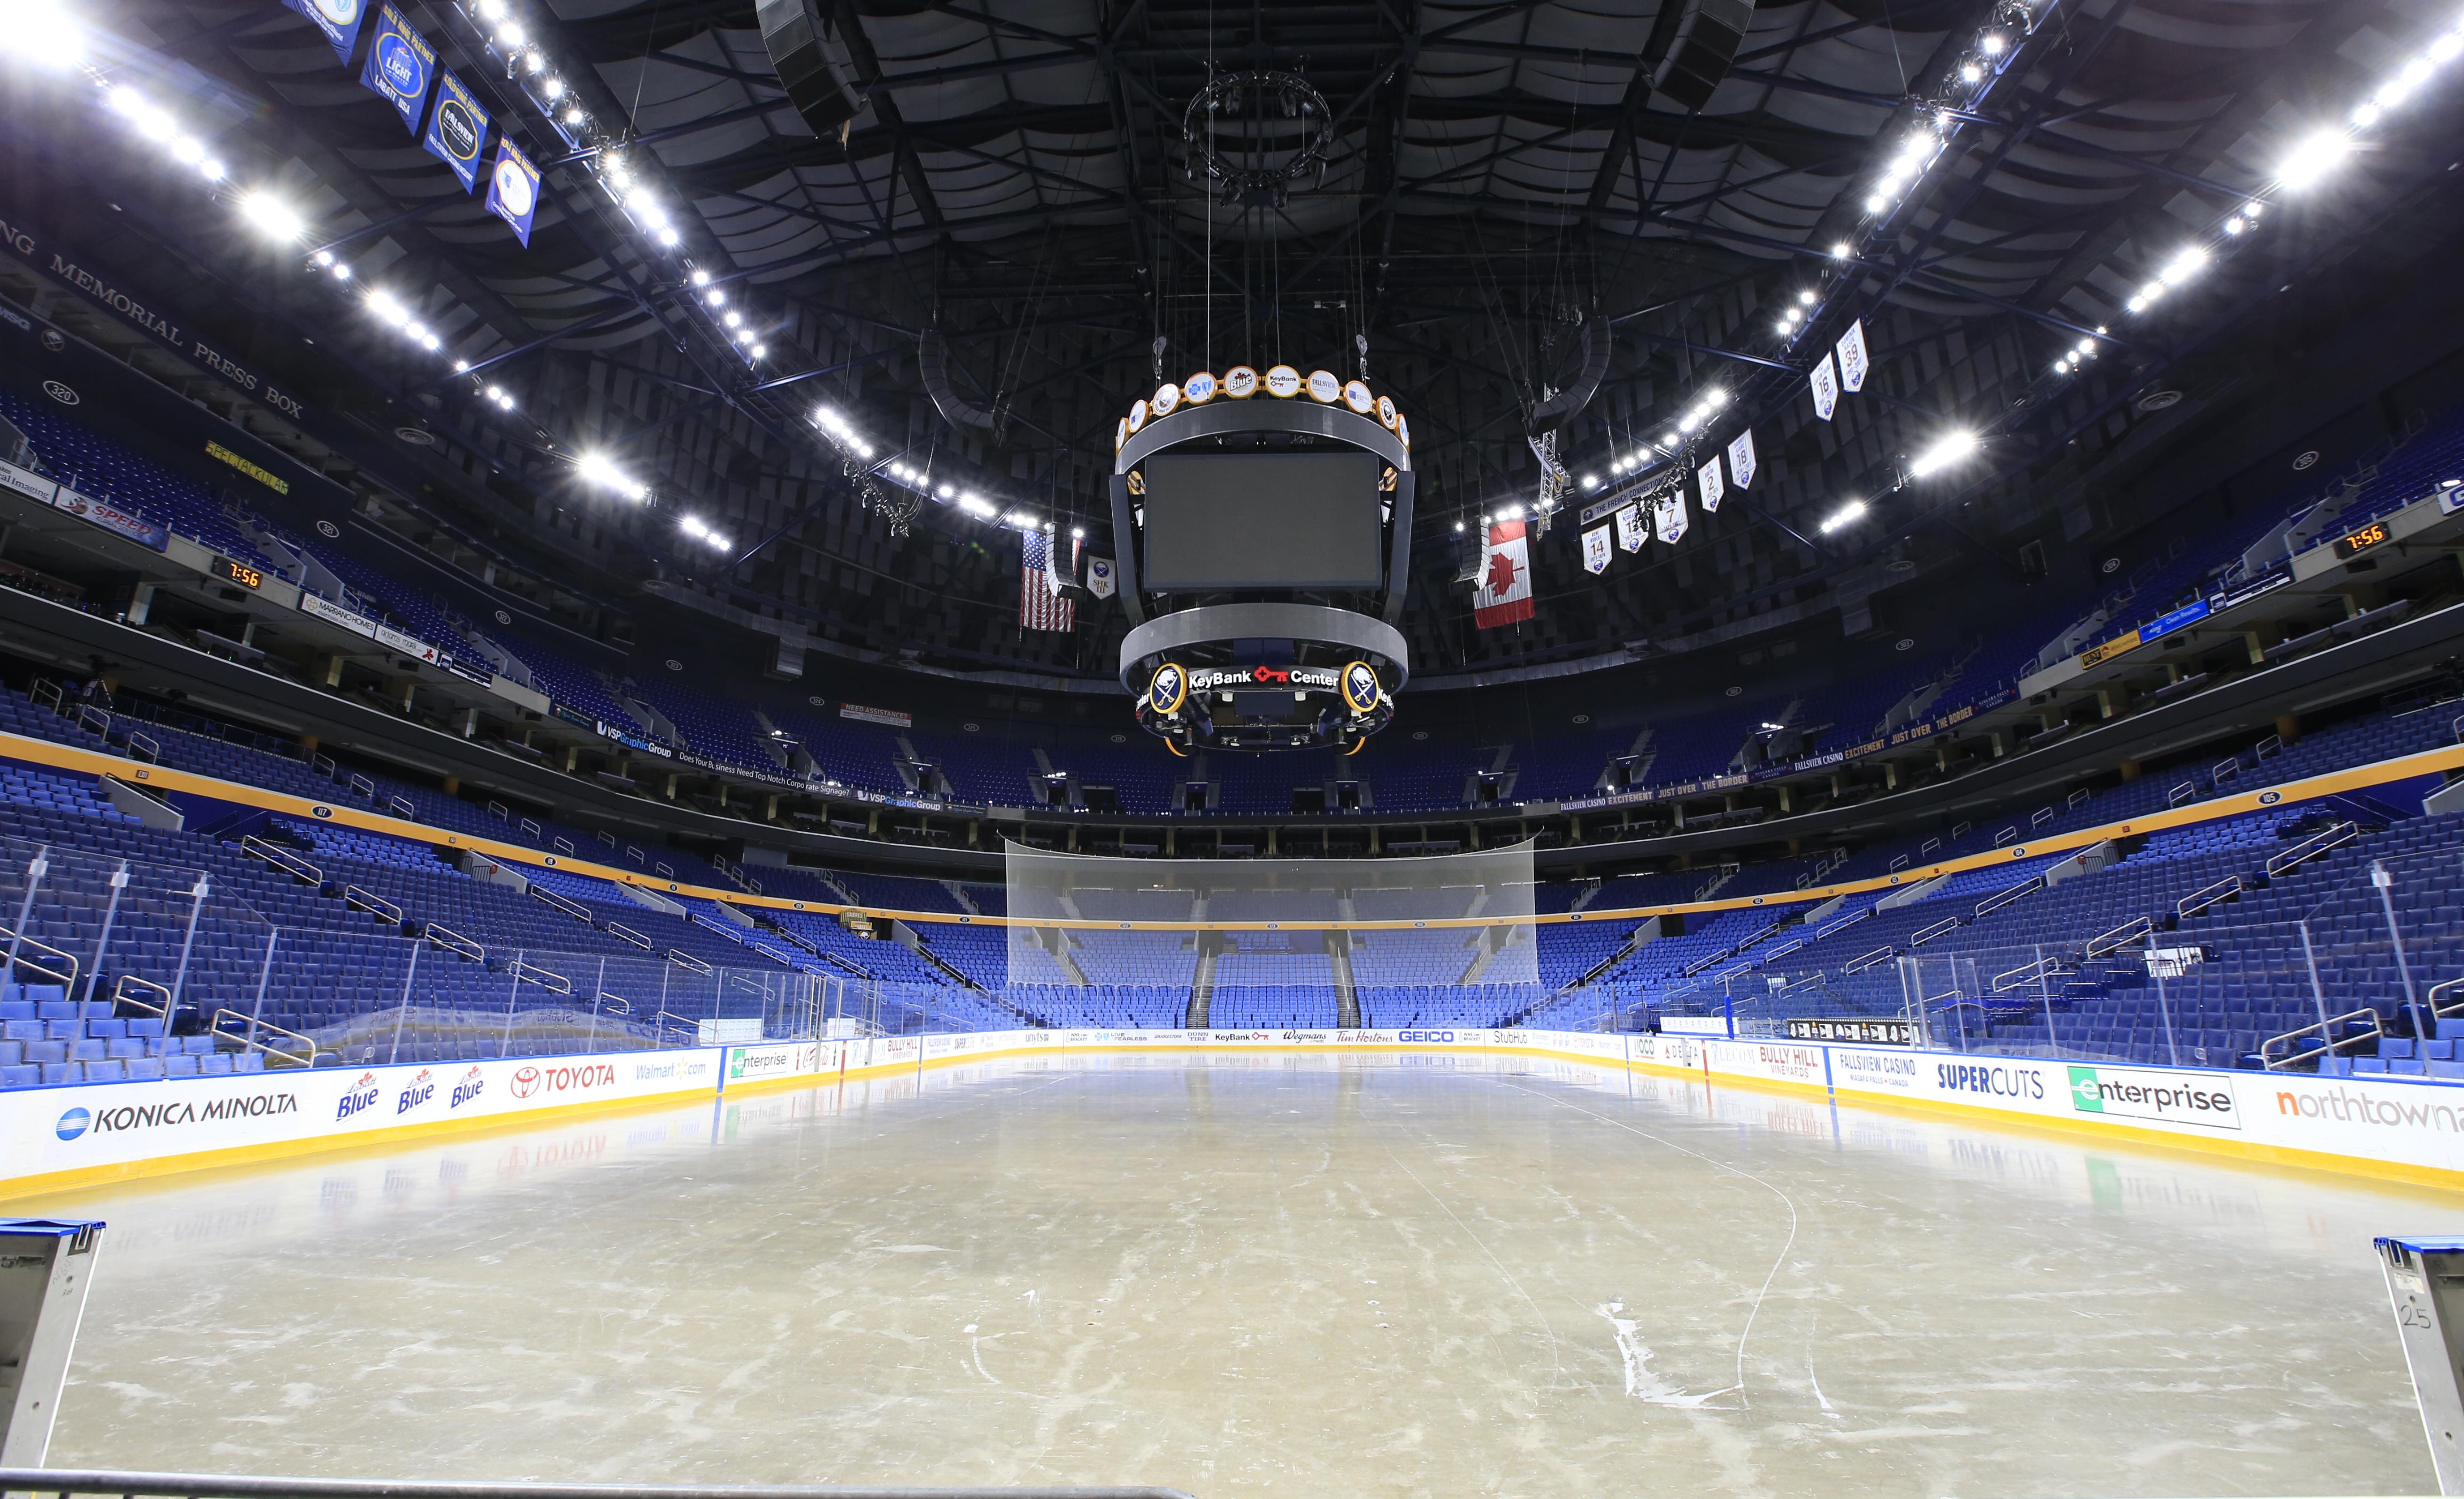 Sabres sign Finnish forward Arttu Ruotsalainen – The Buffalo News